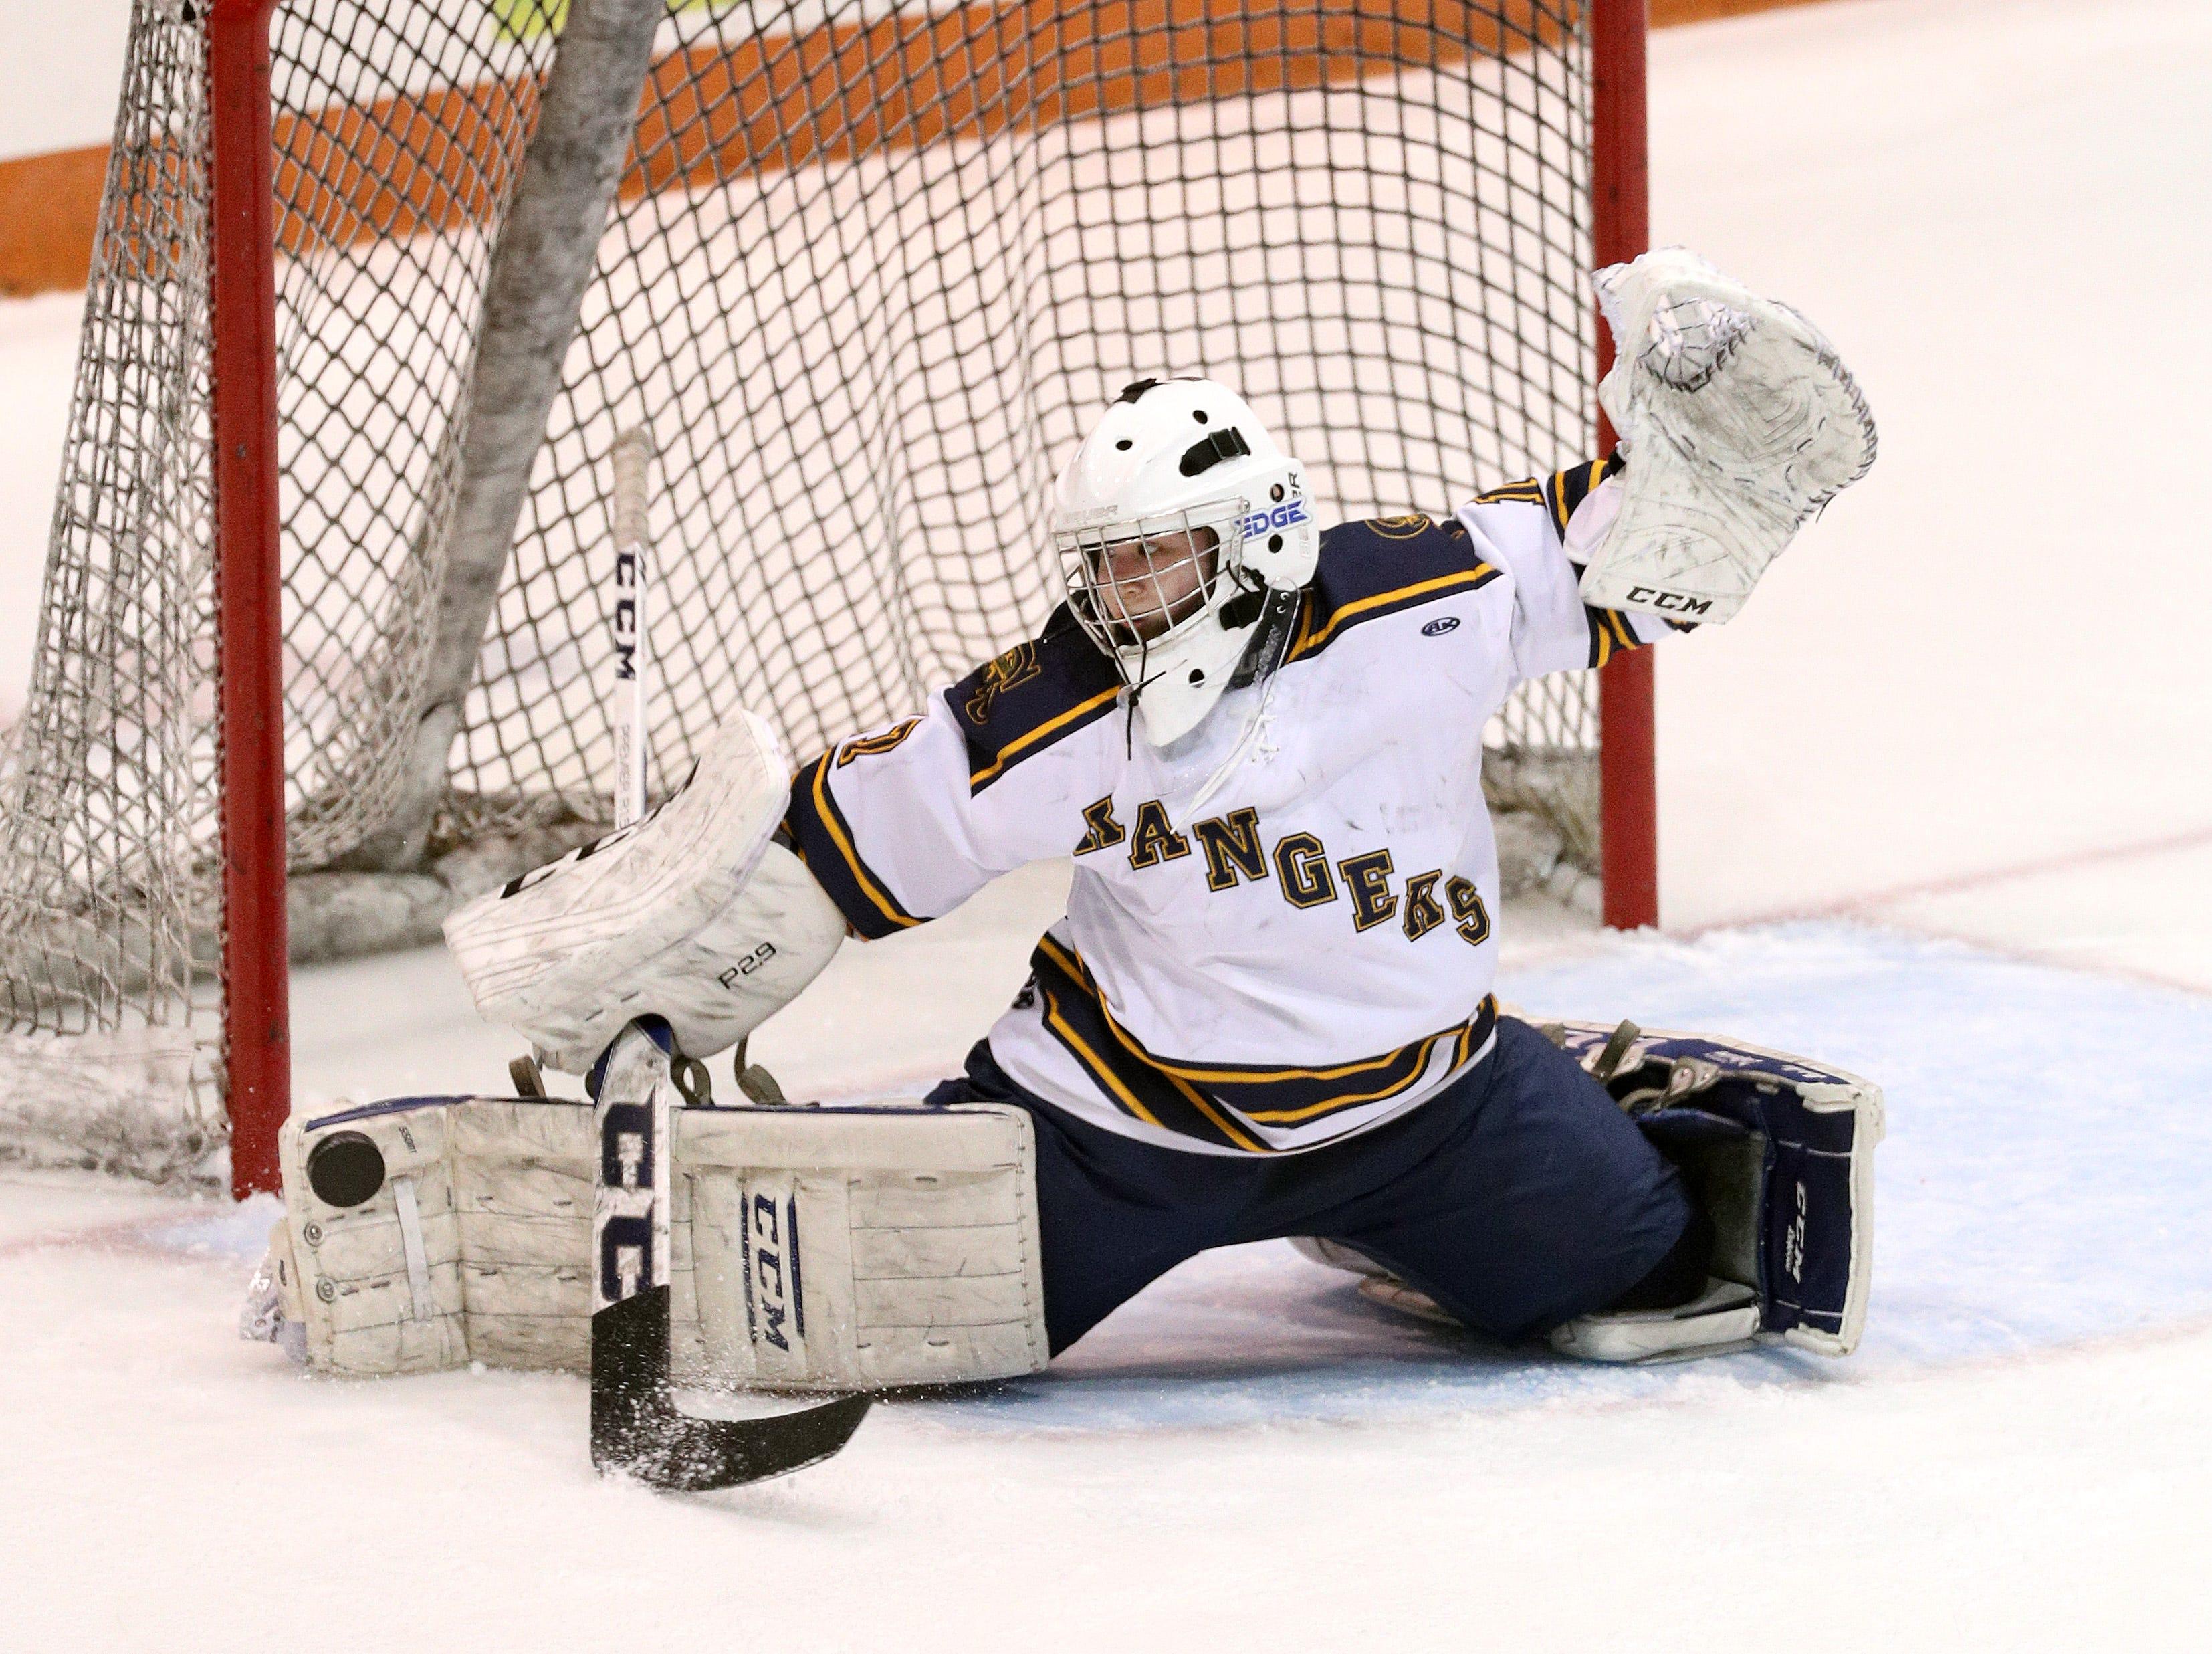 Spencerport goalie Rachel Brase makes a pas save against Canandaigua.